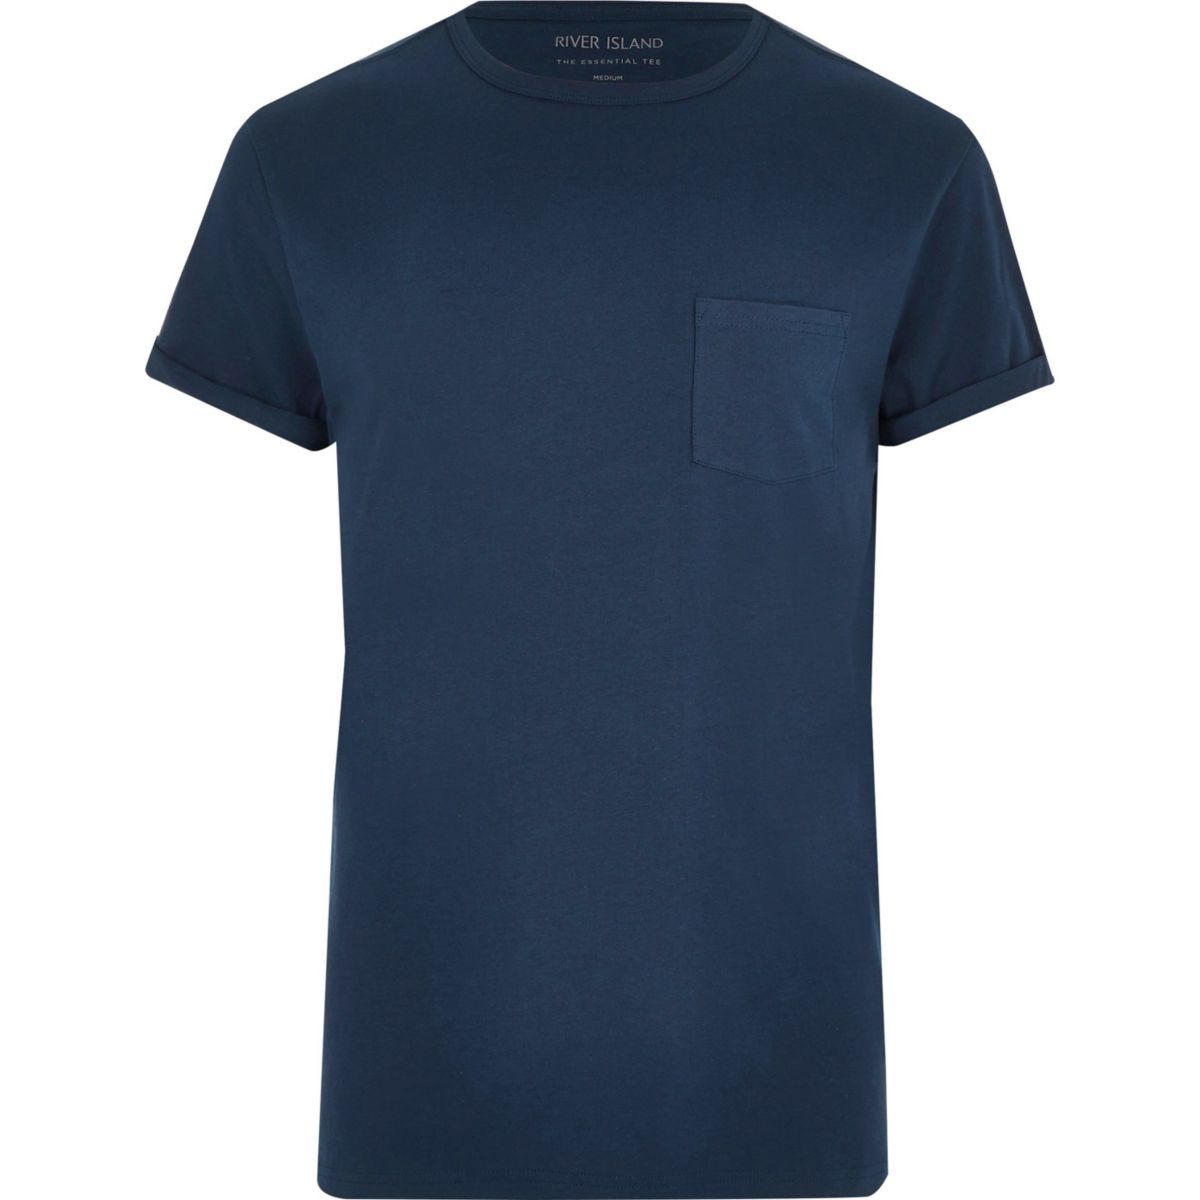 Tall pocket and T navy Big shirt chest qR6c5